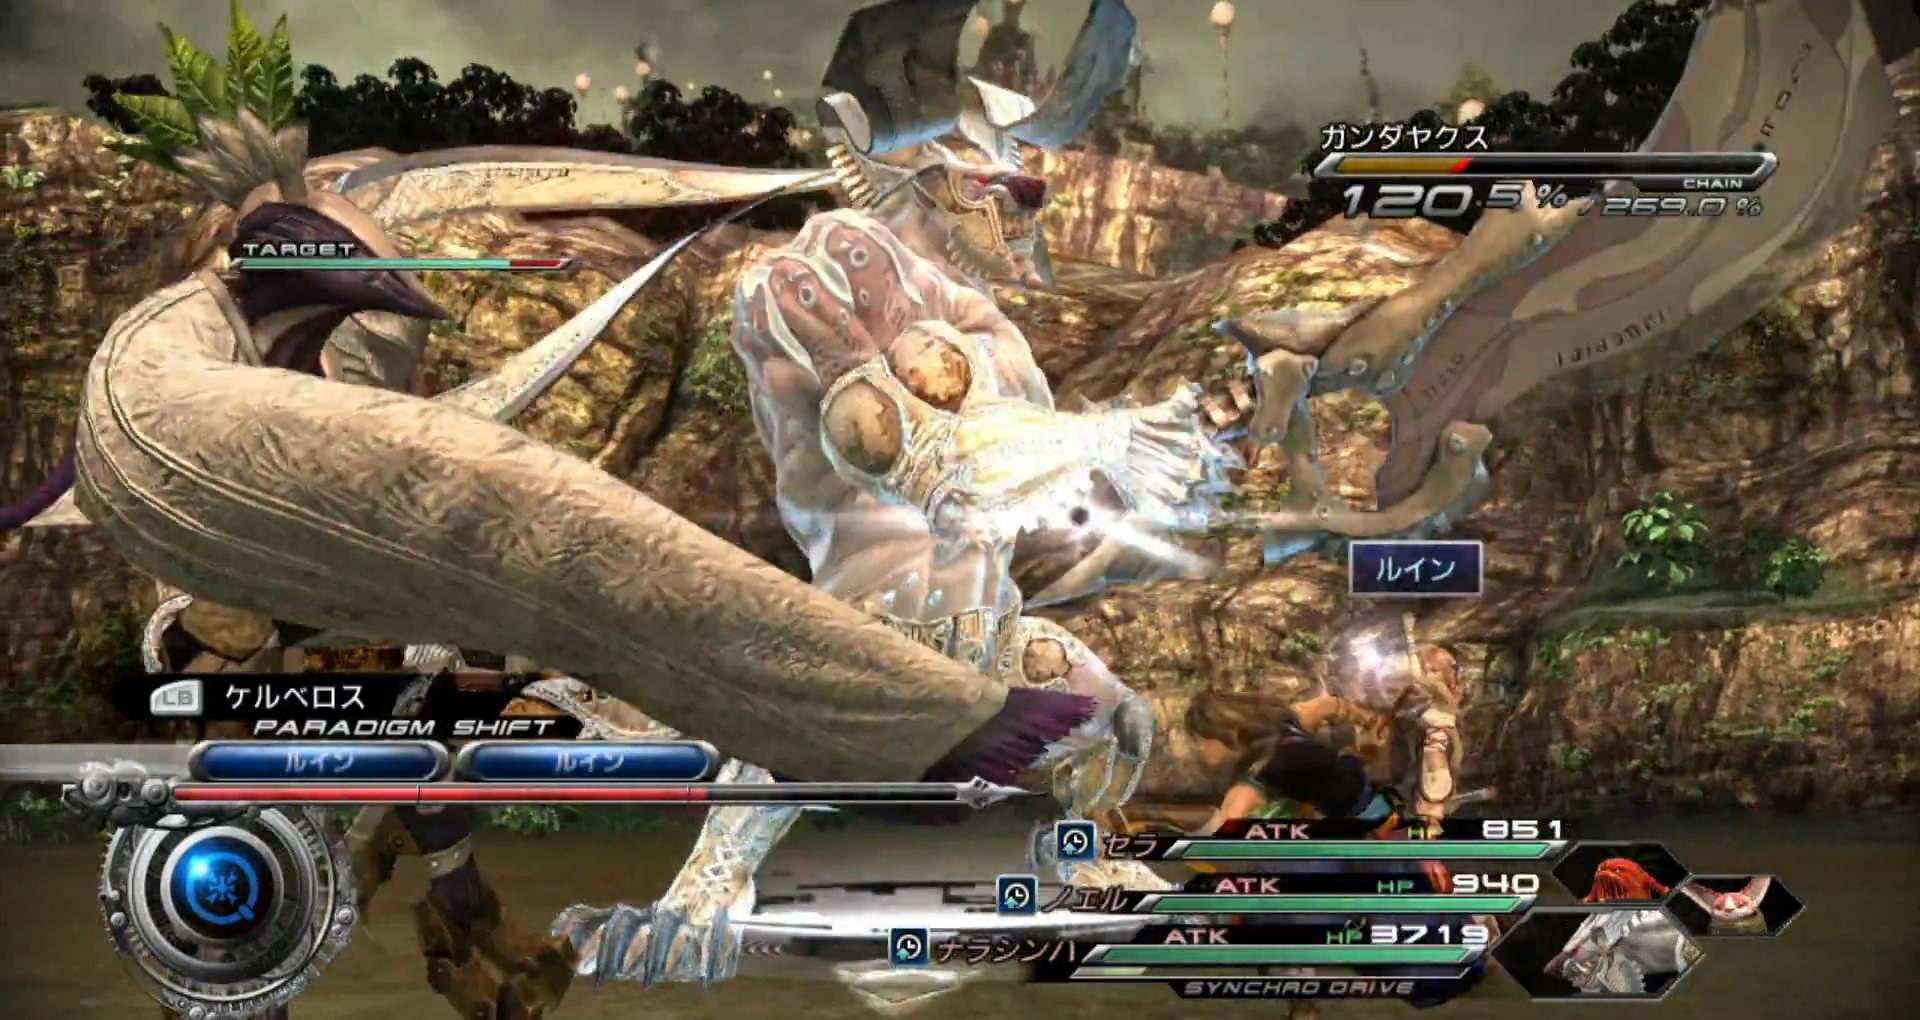 Screenshots - for Final Fantasy XIII-2 TGS 2011 Xbox 360 Trailer